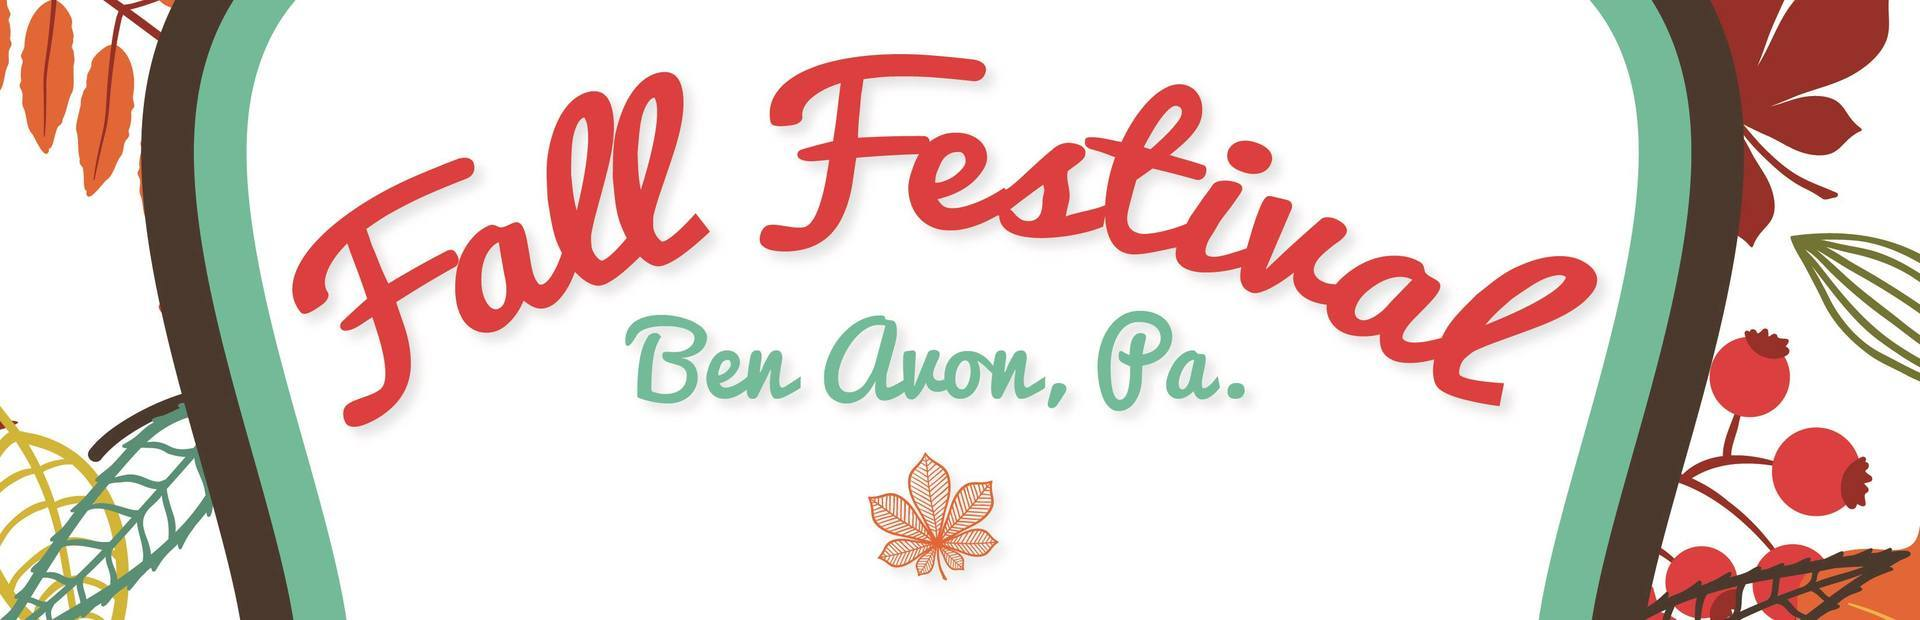 Ben Avon Fall Festival